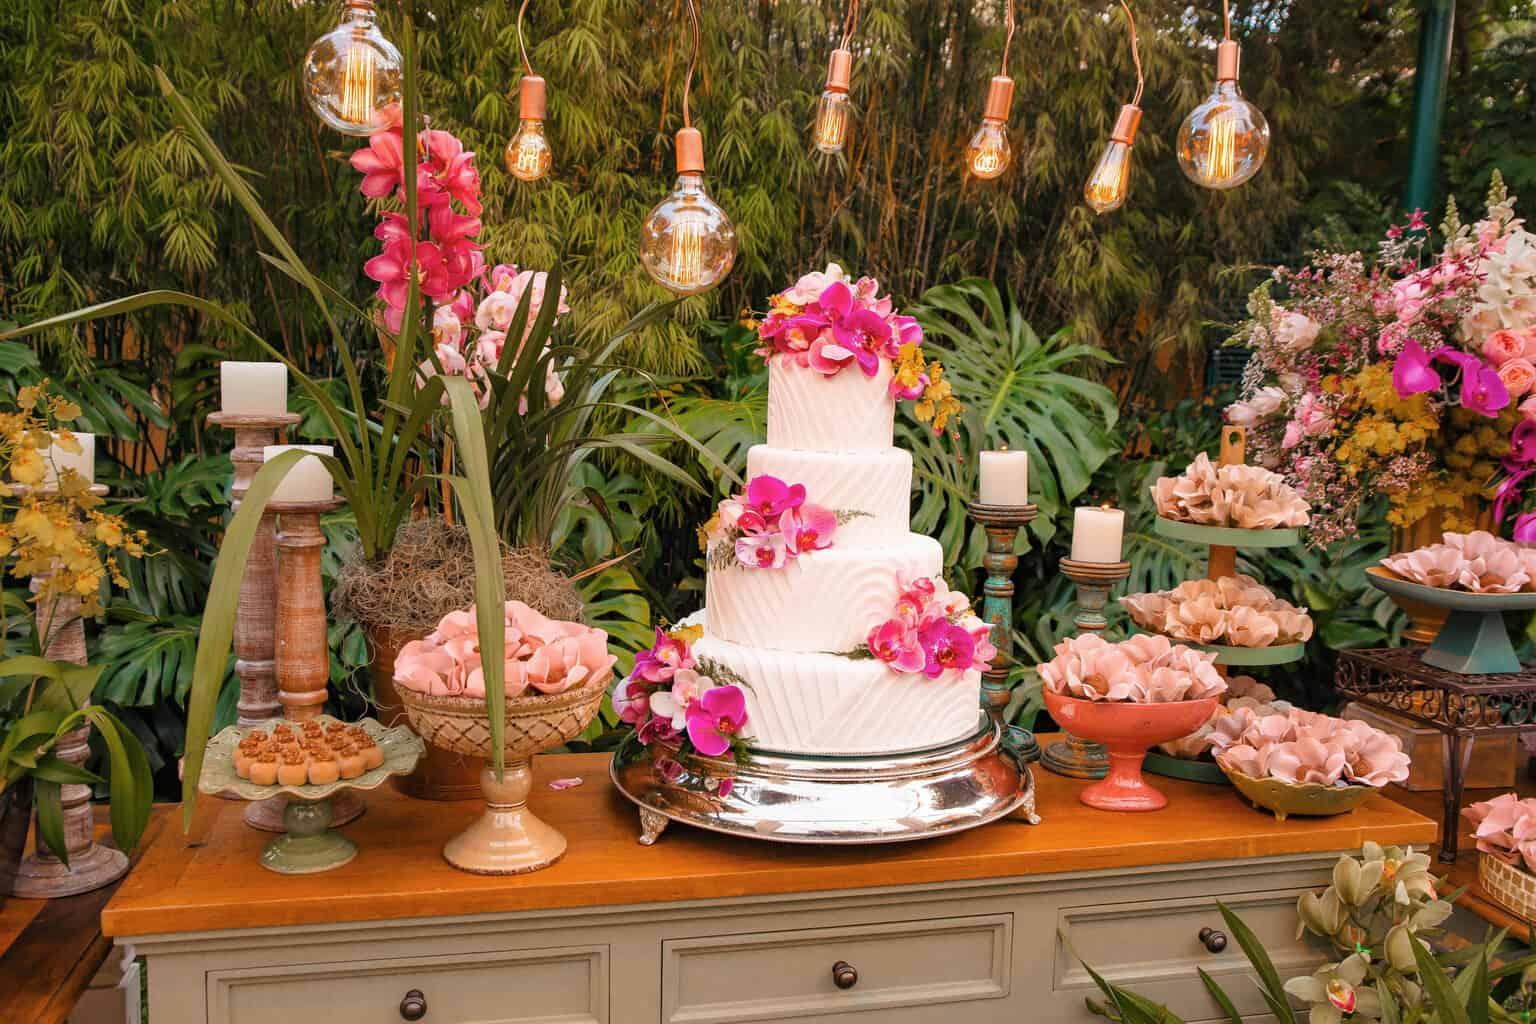 casamento-Beatriz-e-Joao-Fernando-decoracao-colorida-Itaipava-Locanda-Della-Mimosa-Thienny-Tammis70